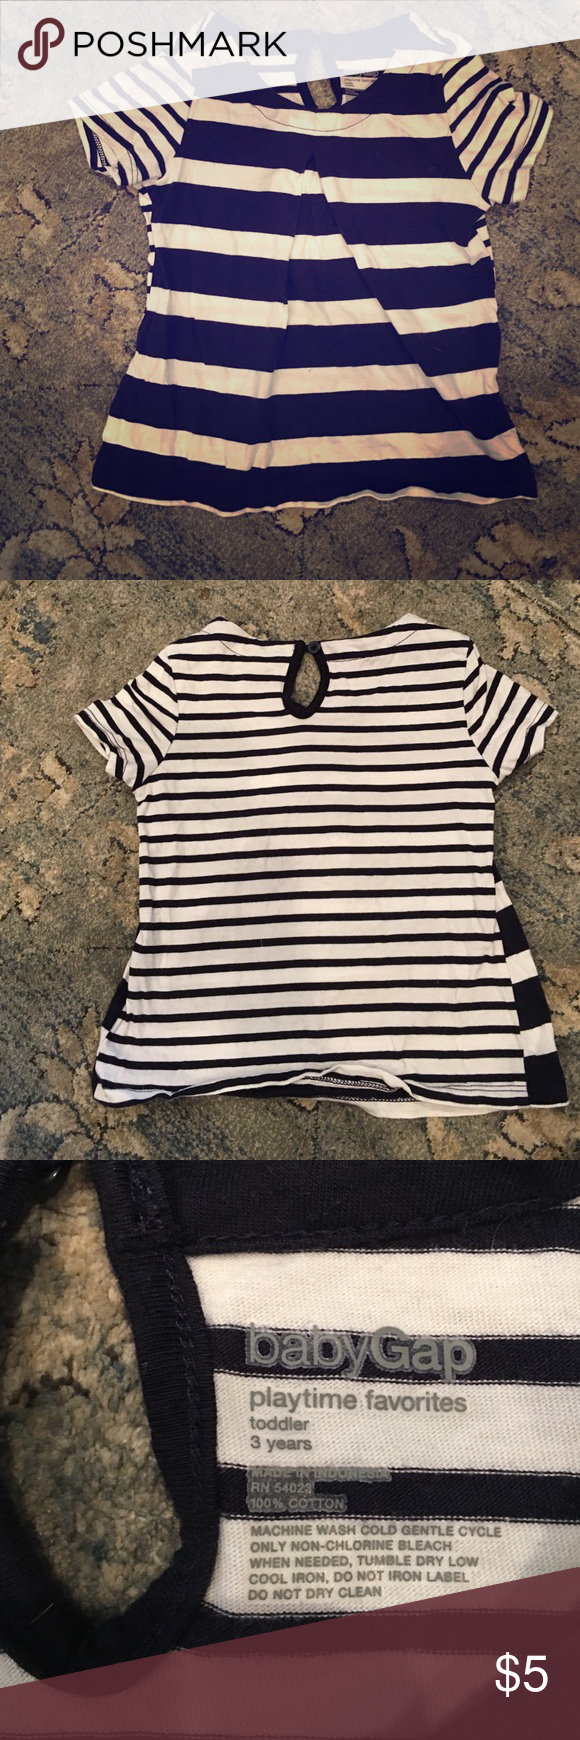 Gap toddler girl stripe shirt. Little cute toddler Gap stripe shirt.  Size 3t.  Navy and white stripes.  ❌No trades❌ GAP Shirts & Tops Tees - Short Sleeve